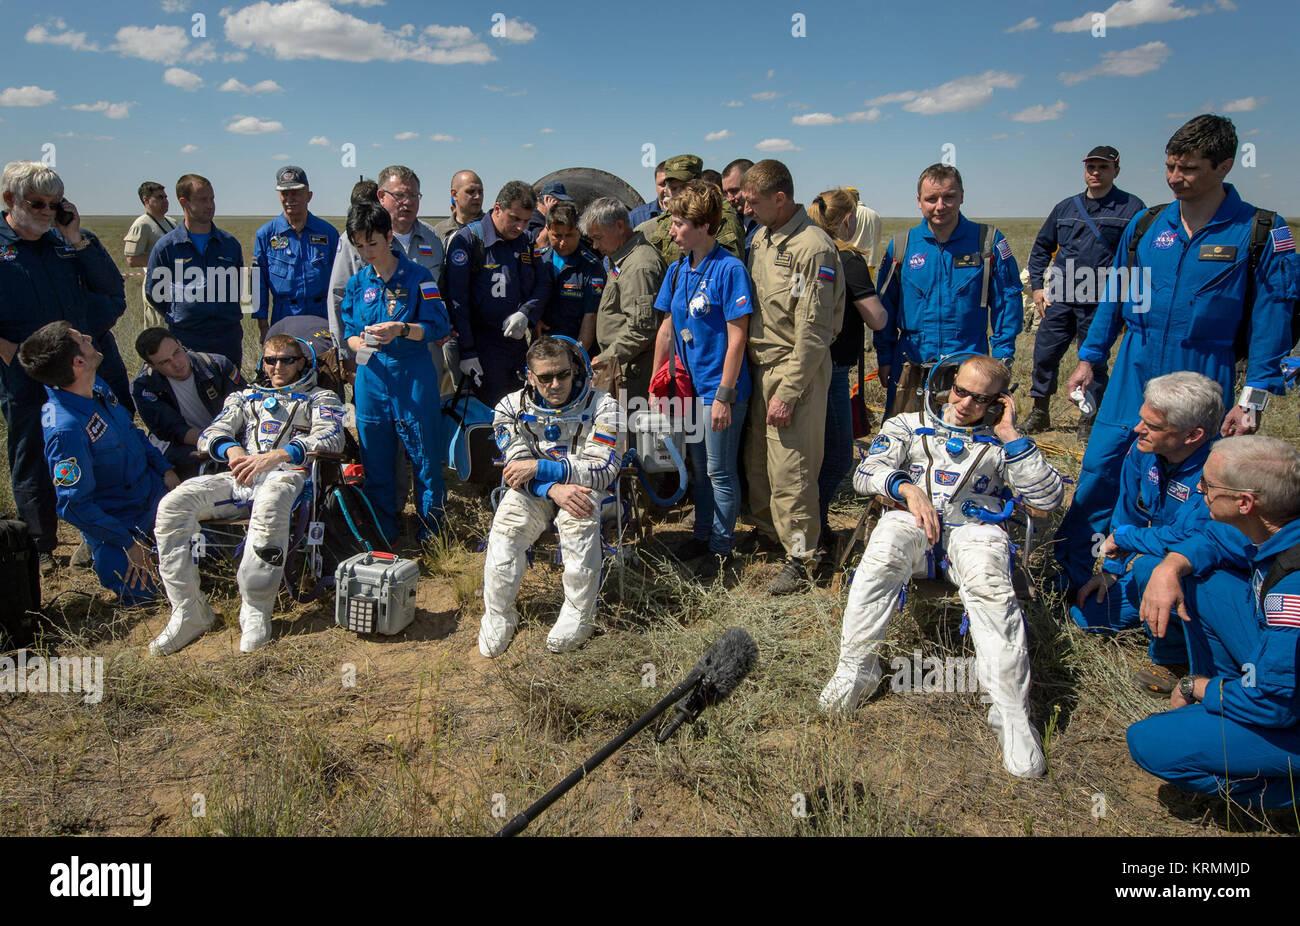 Tim Peake of the European Space Agency, left, Yuri Malenchenko of Roscosmos center, and Tim Kopra of NASA sit in - Stock Image